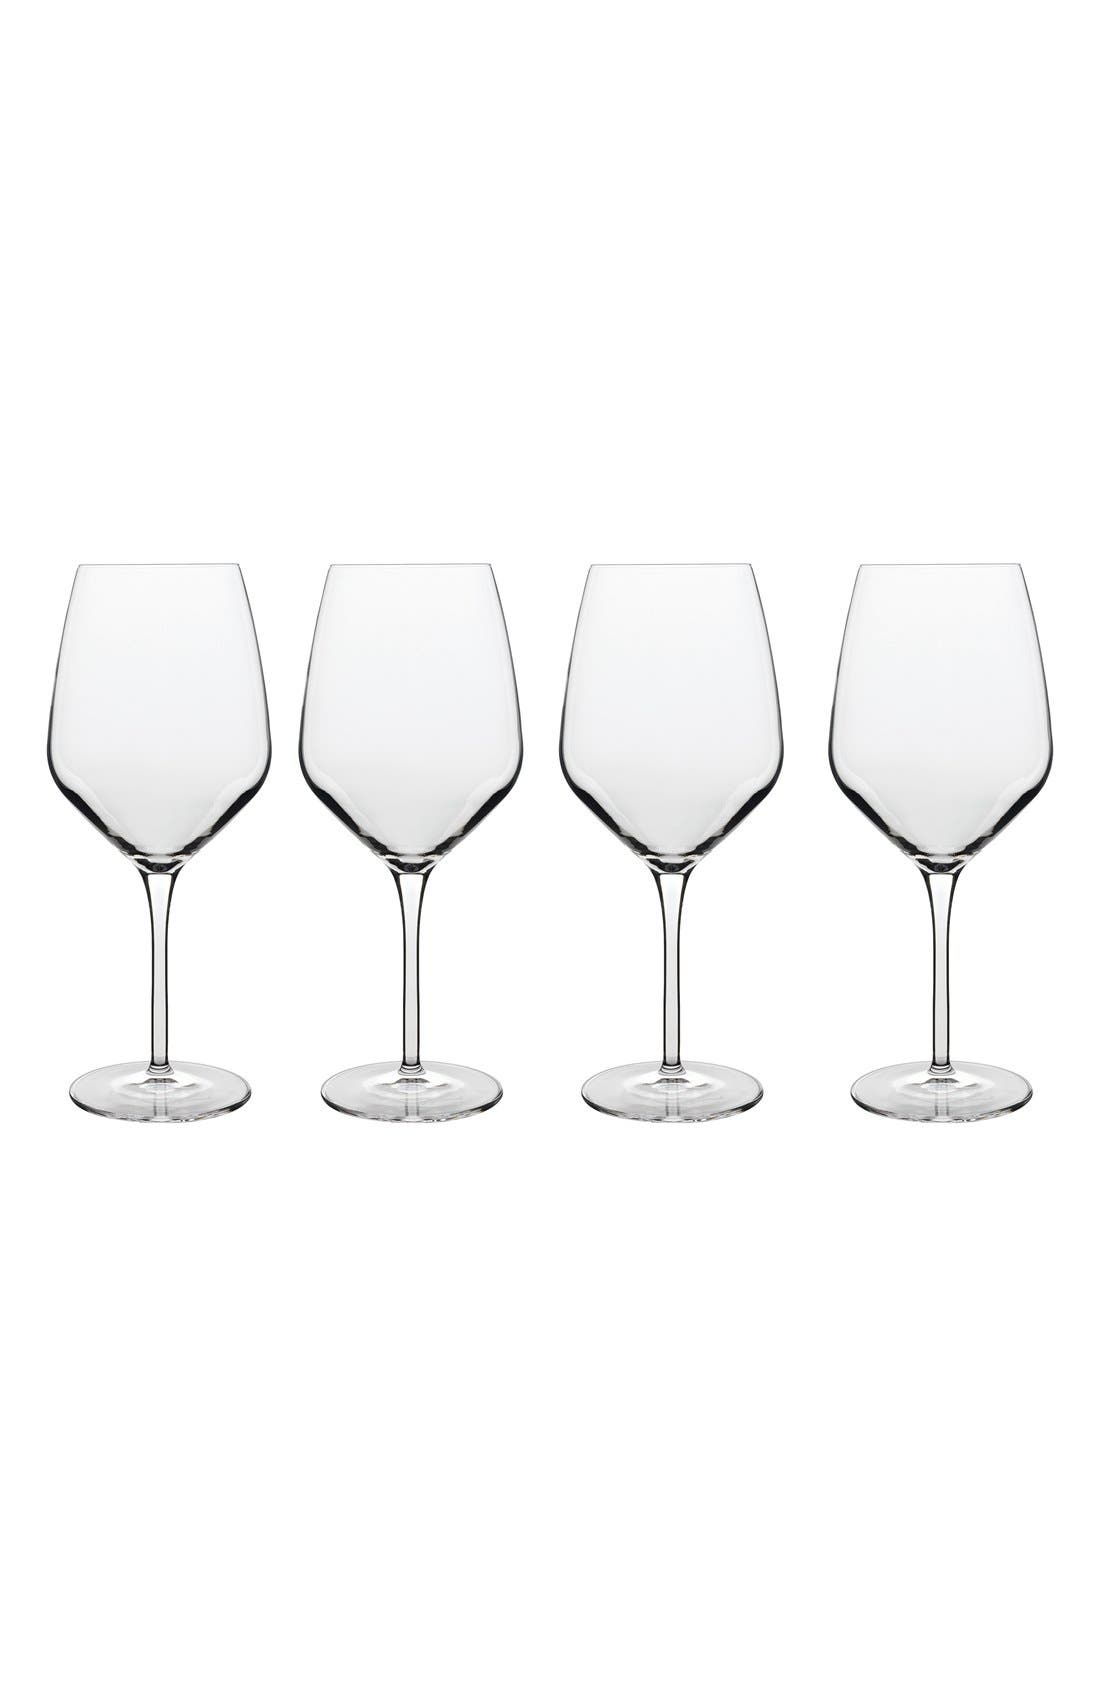 Prestige Set of 4 Wine Glasses,                             Main thumbnail 1, color,                             White